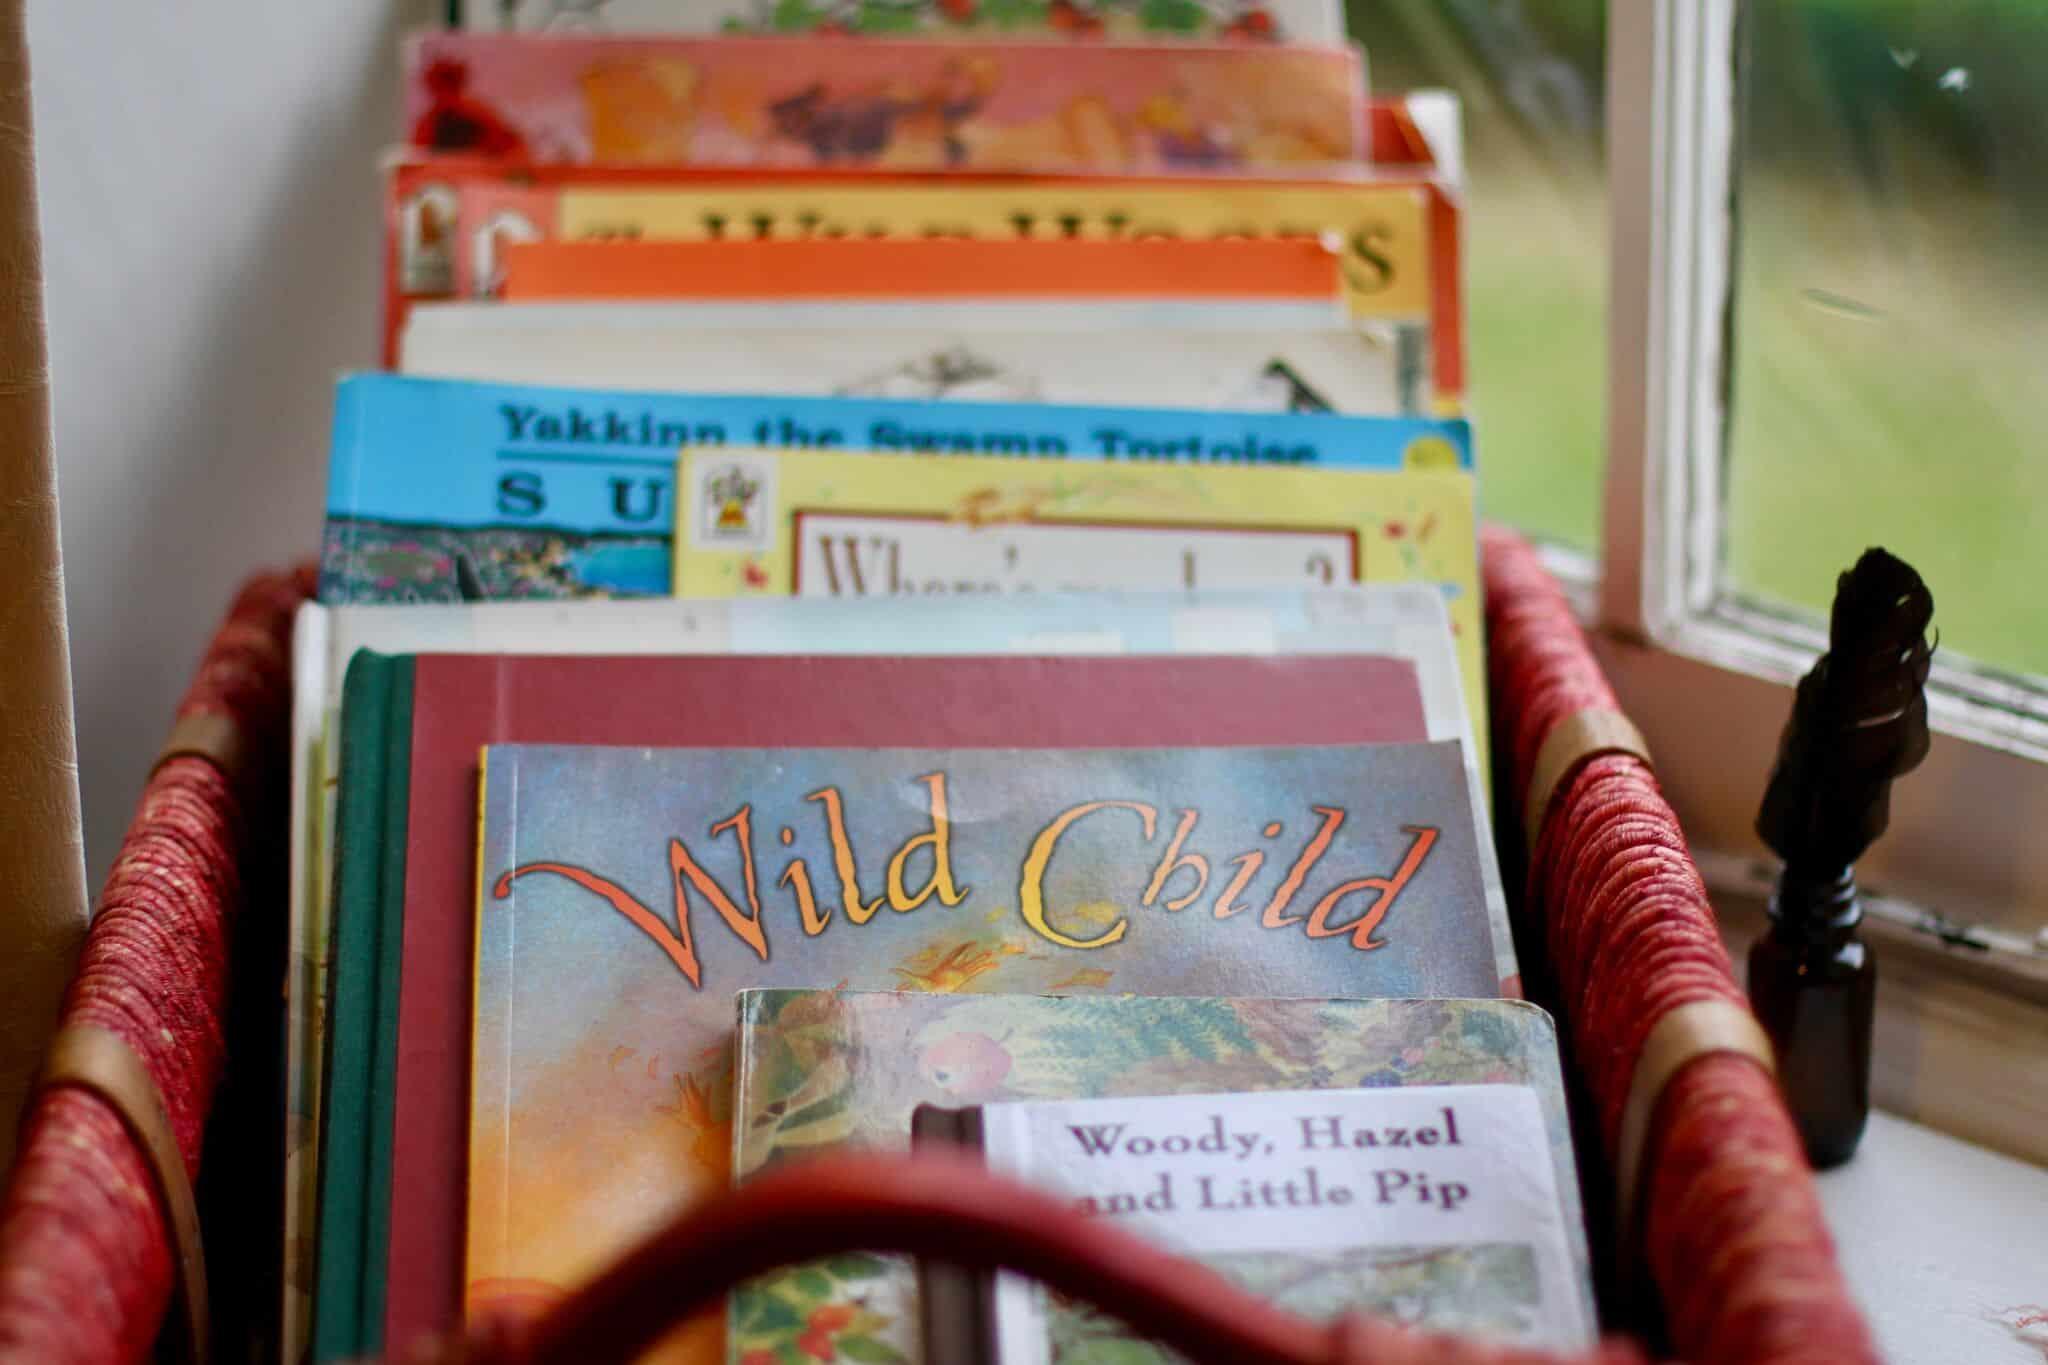 Seasonal children's books in a basket